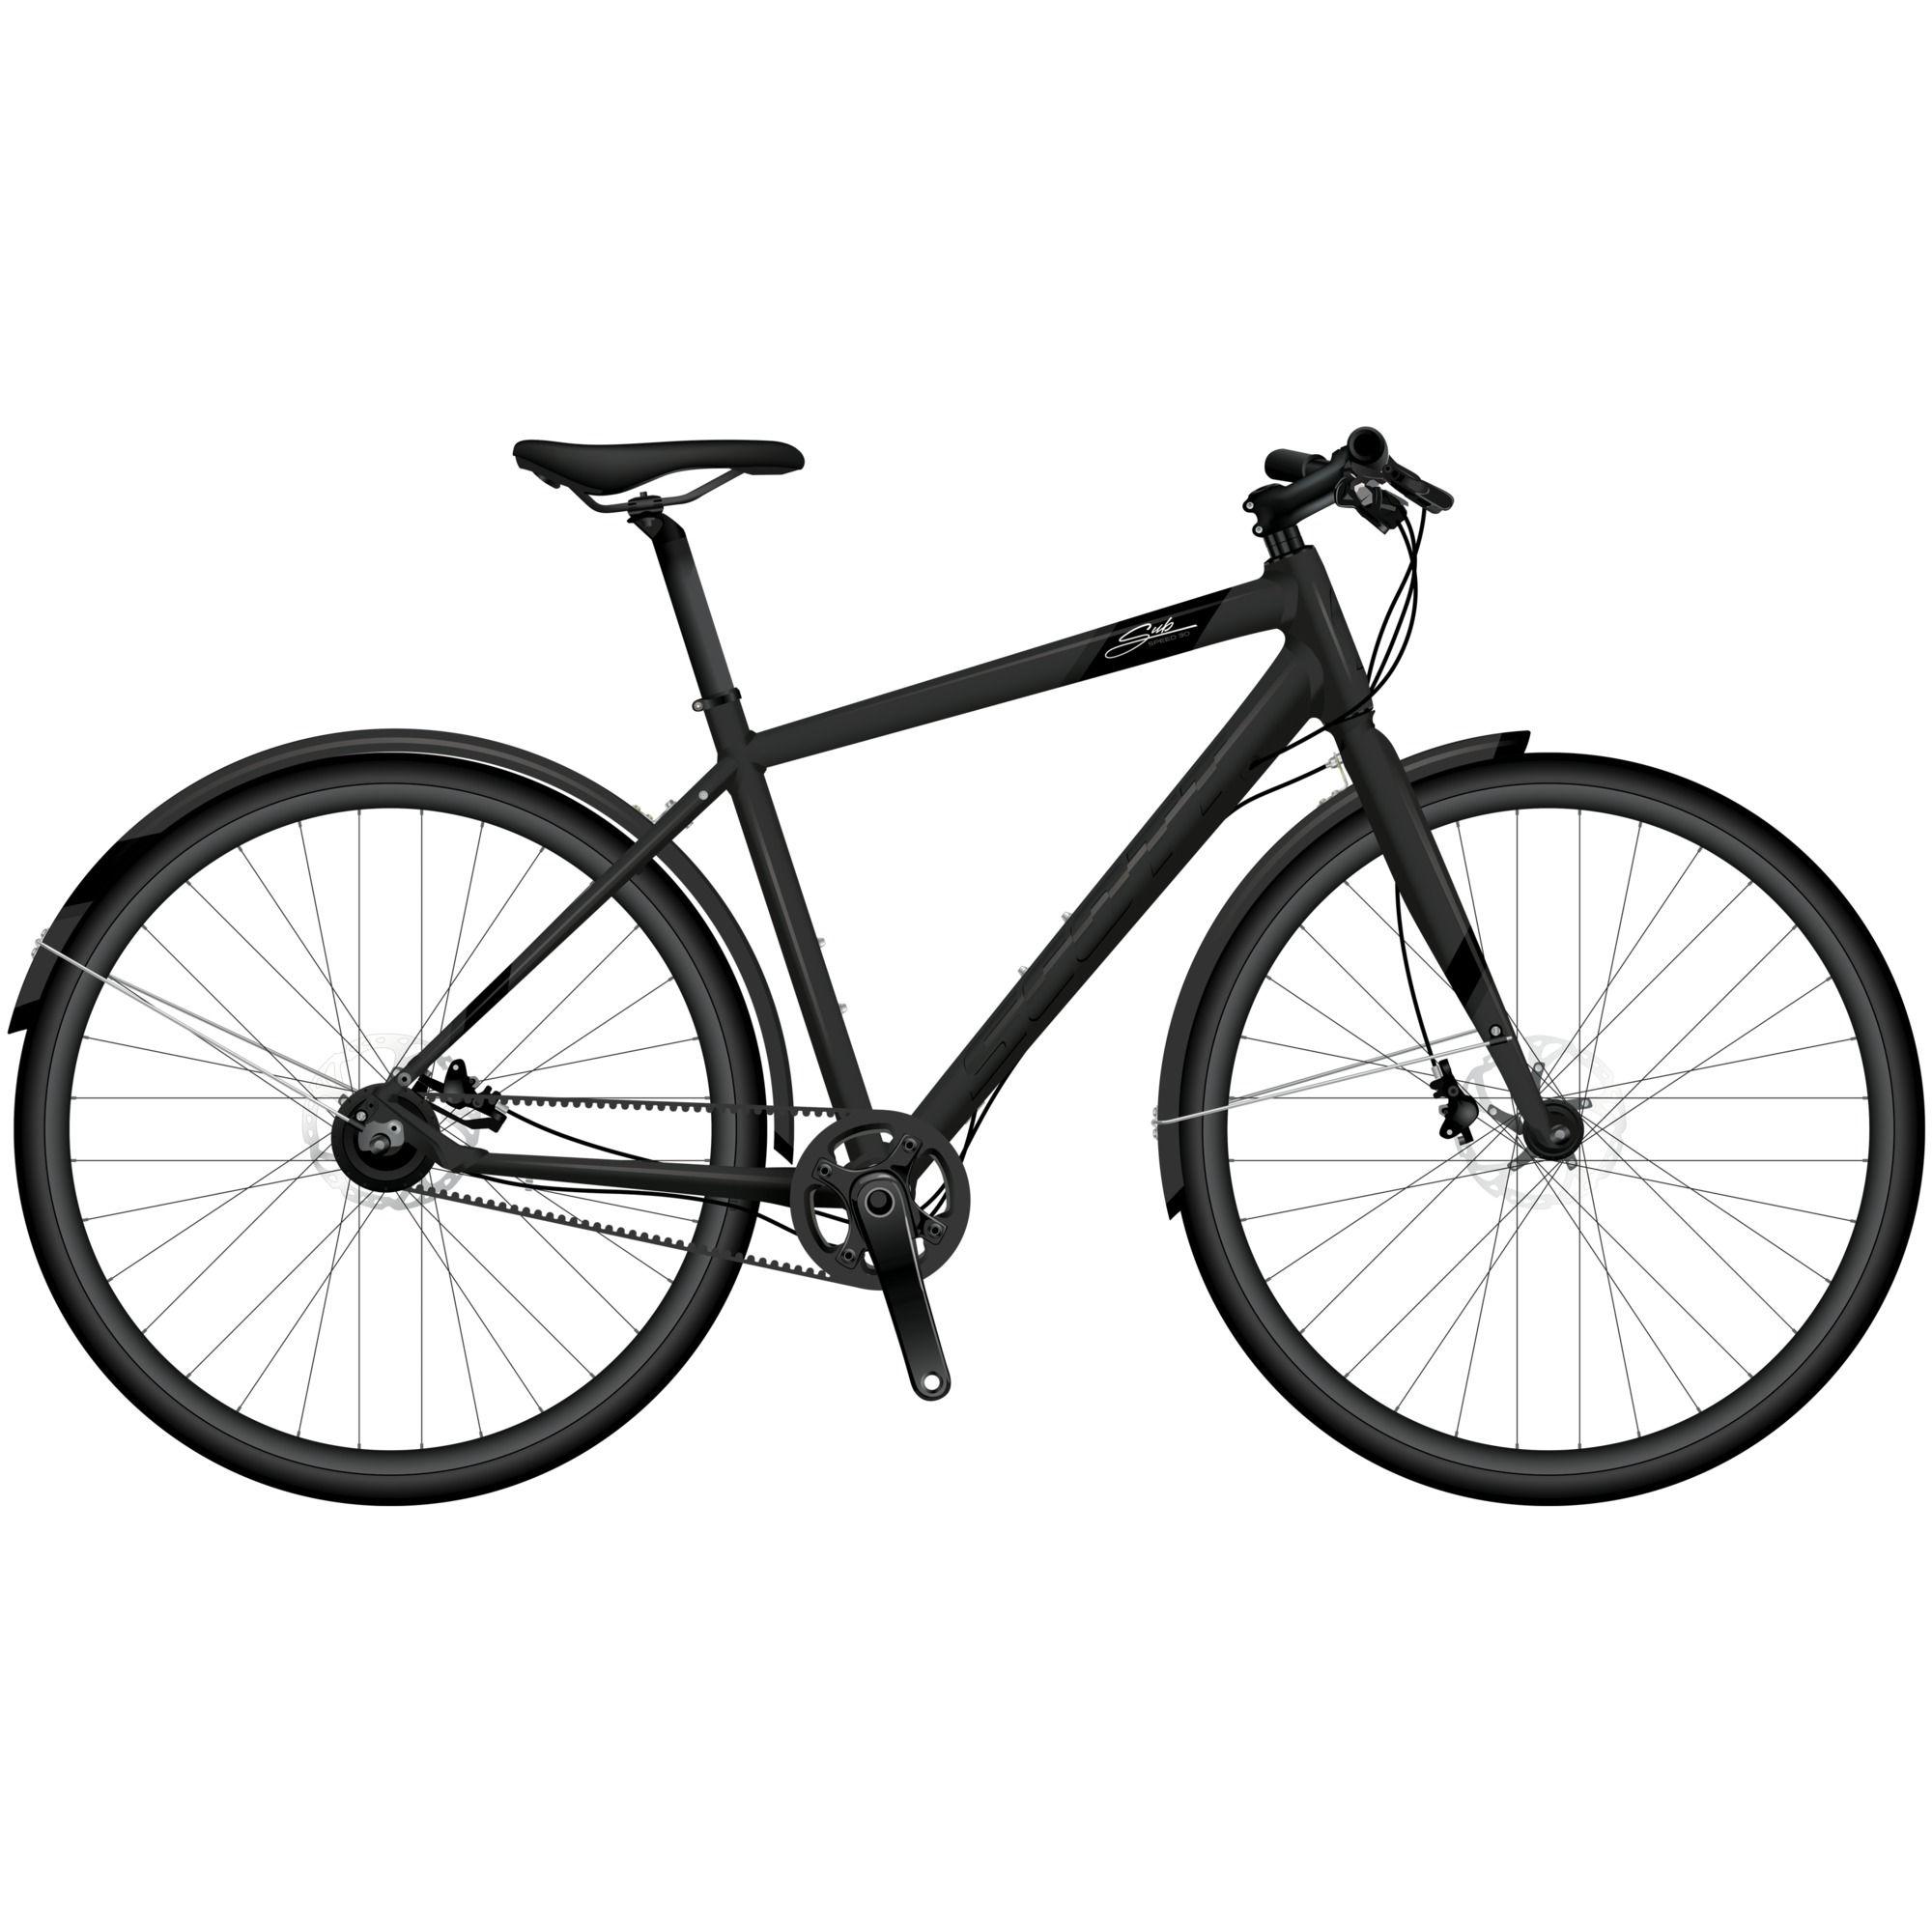 The Scott Sub Speed 10 Is A Modern Urban Bike That Sports Cool